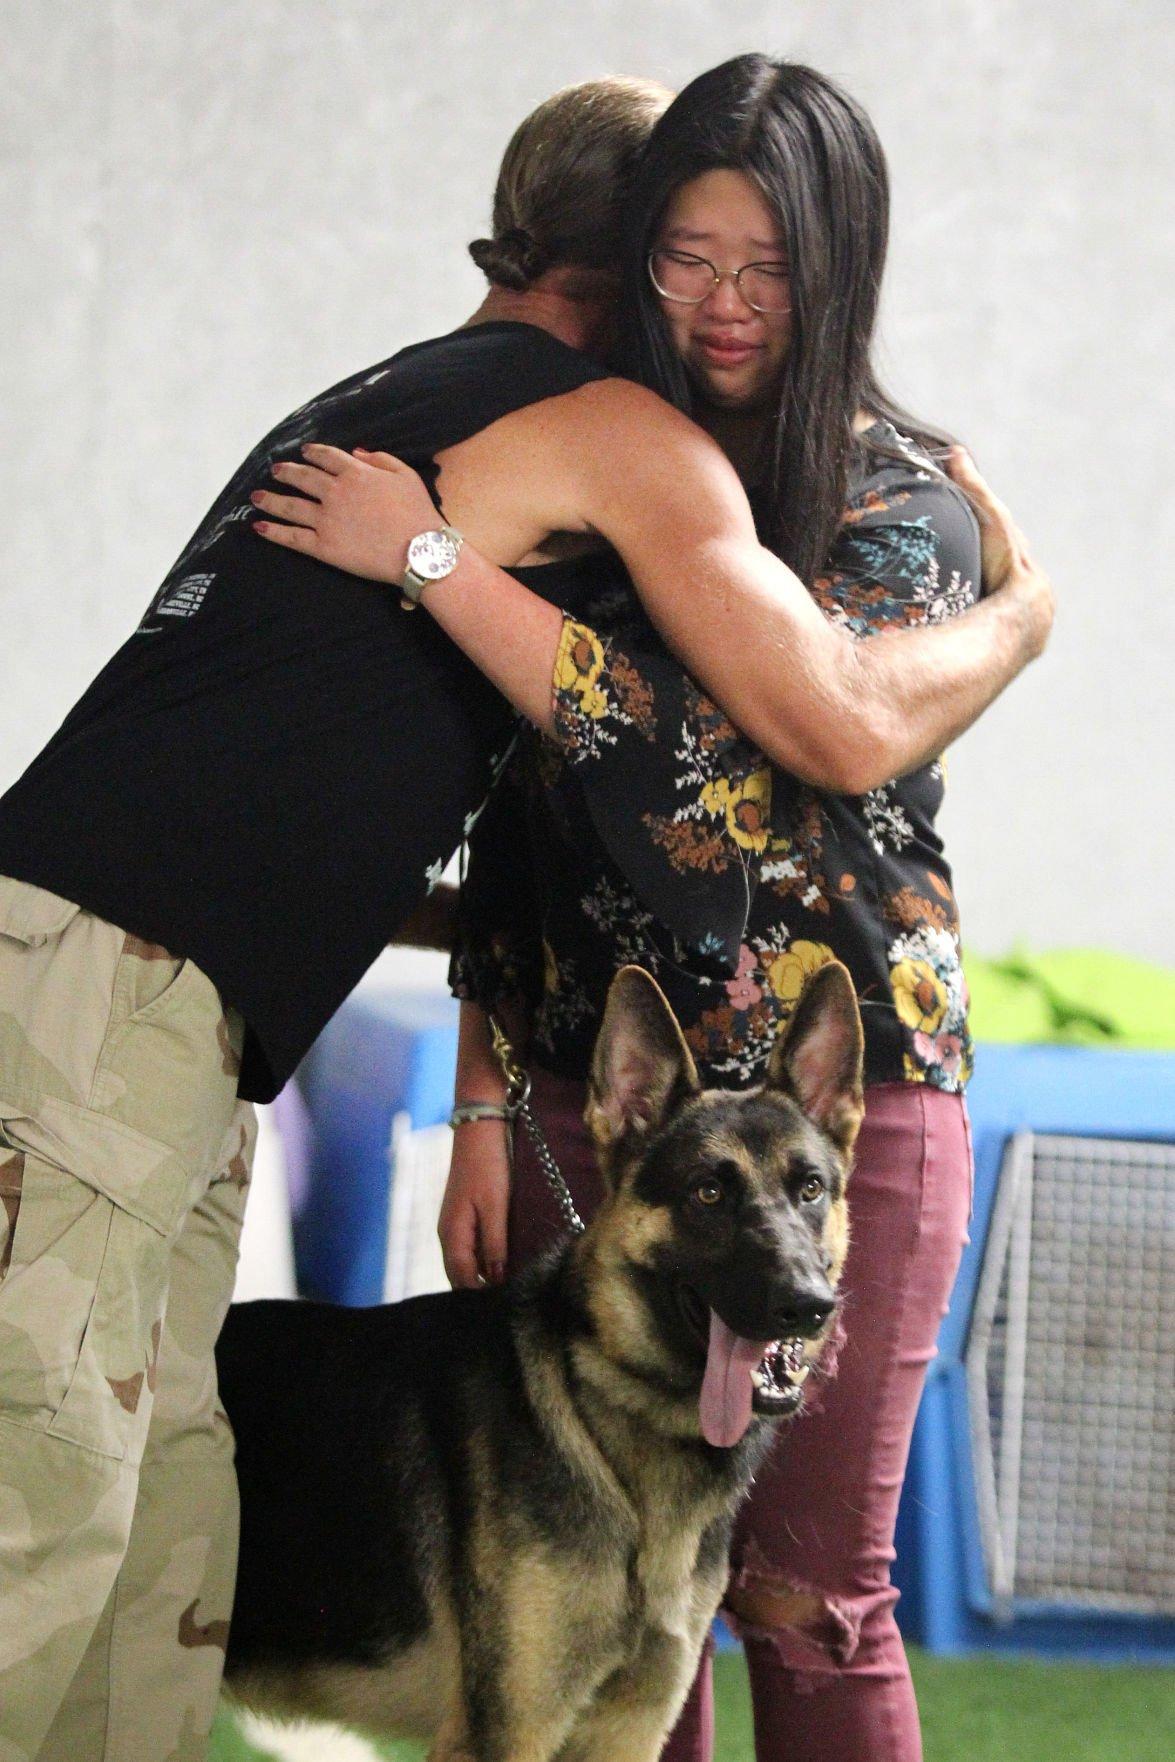 djr-2018-08-14-news-dog-donationp1